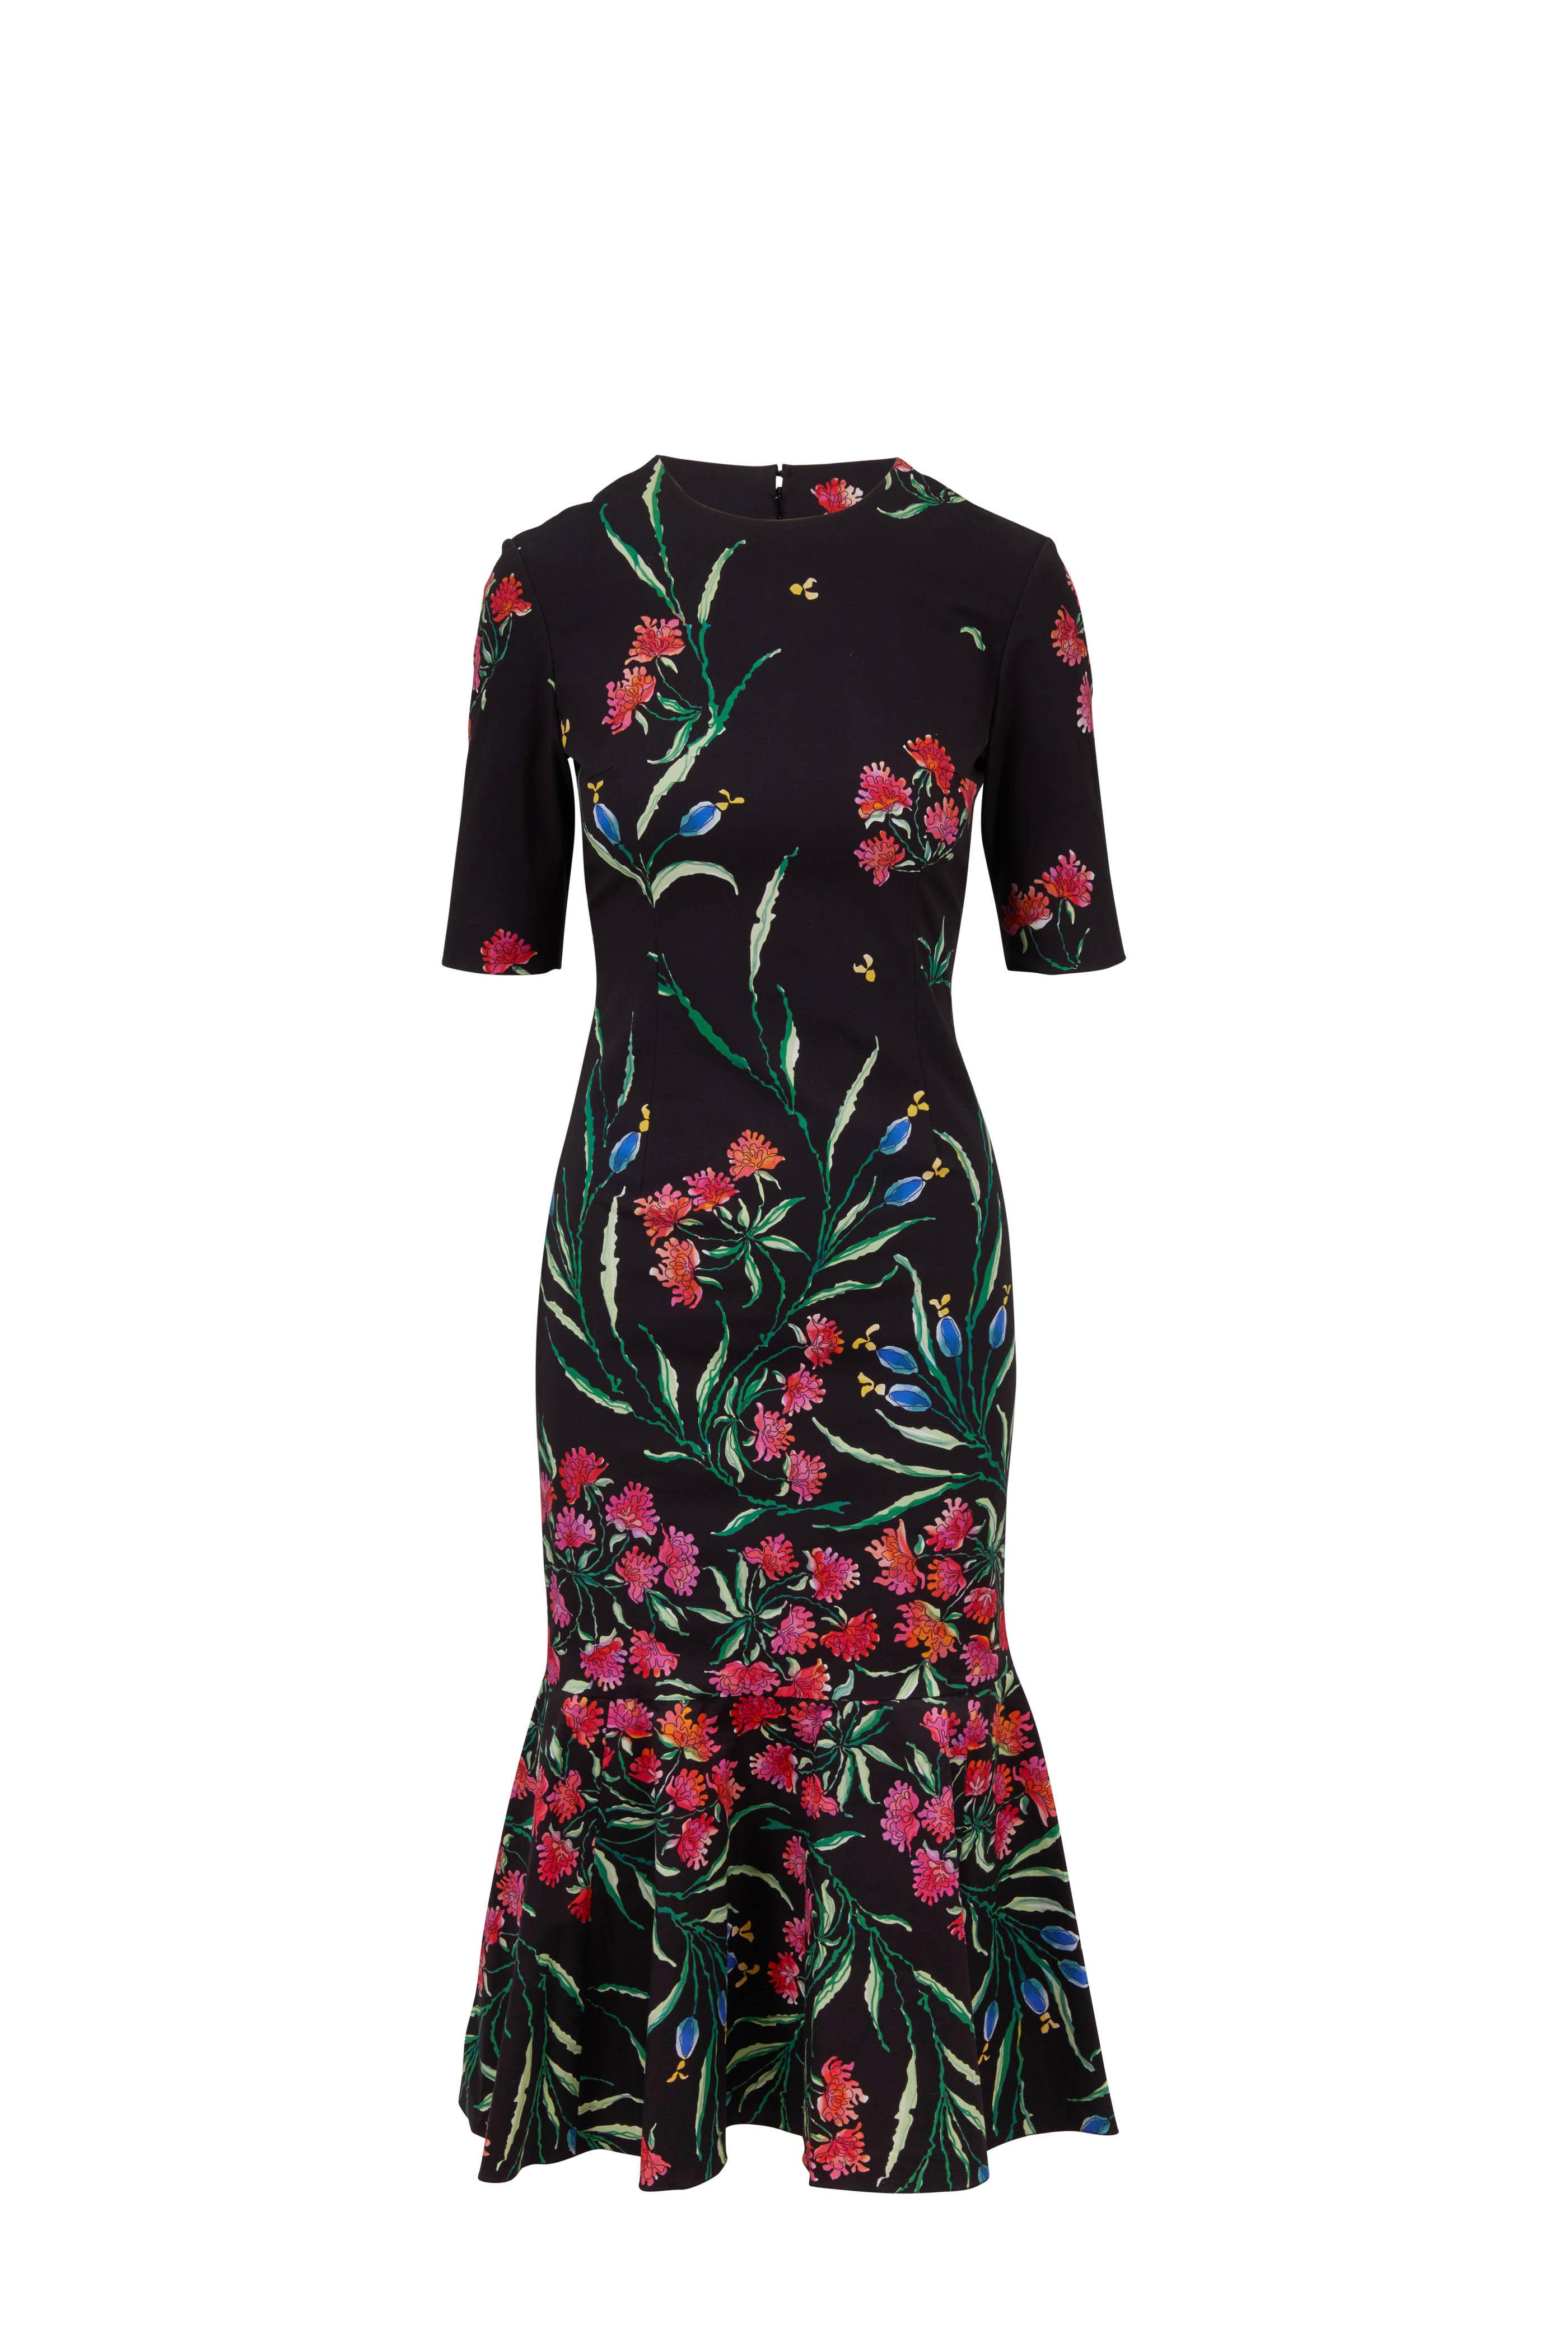 225663c0fb3cd Carolina Herrera. Black Floral Print Elbow-Sleeve Trumpet Midi Dress